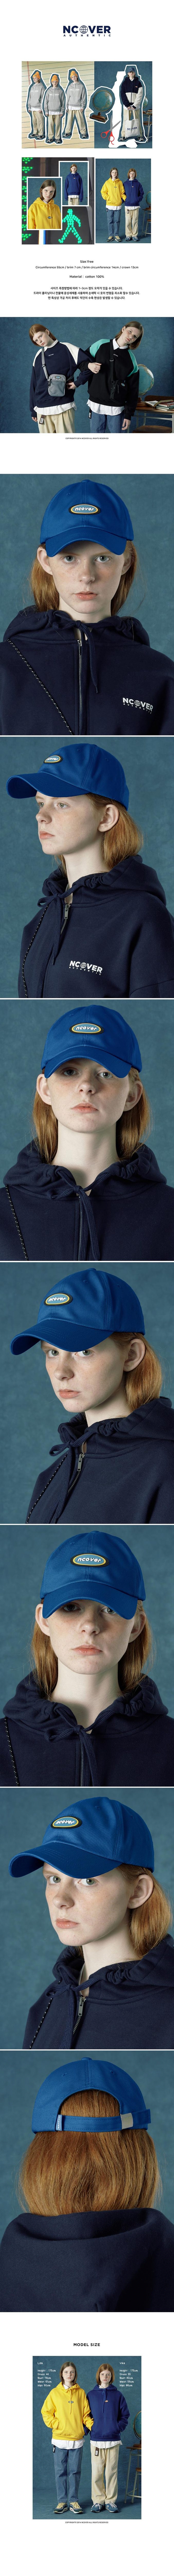 Rubber logo cap-blue.jpg